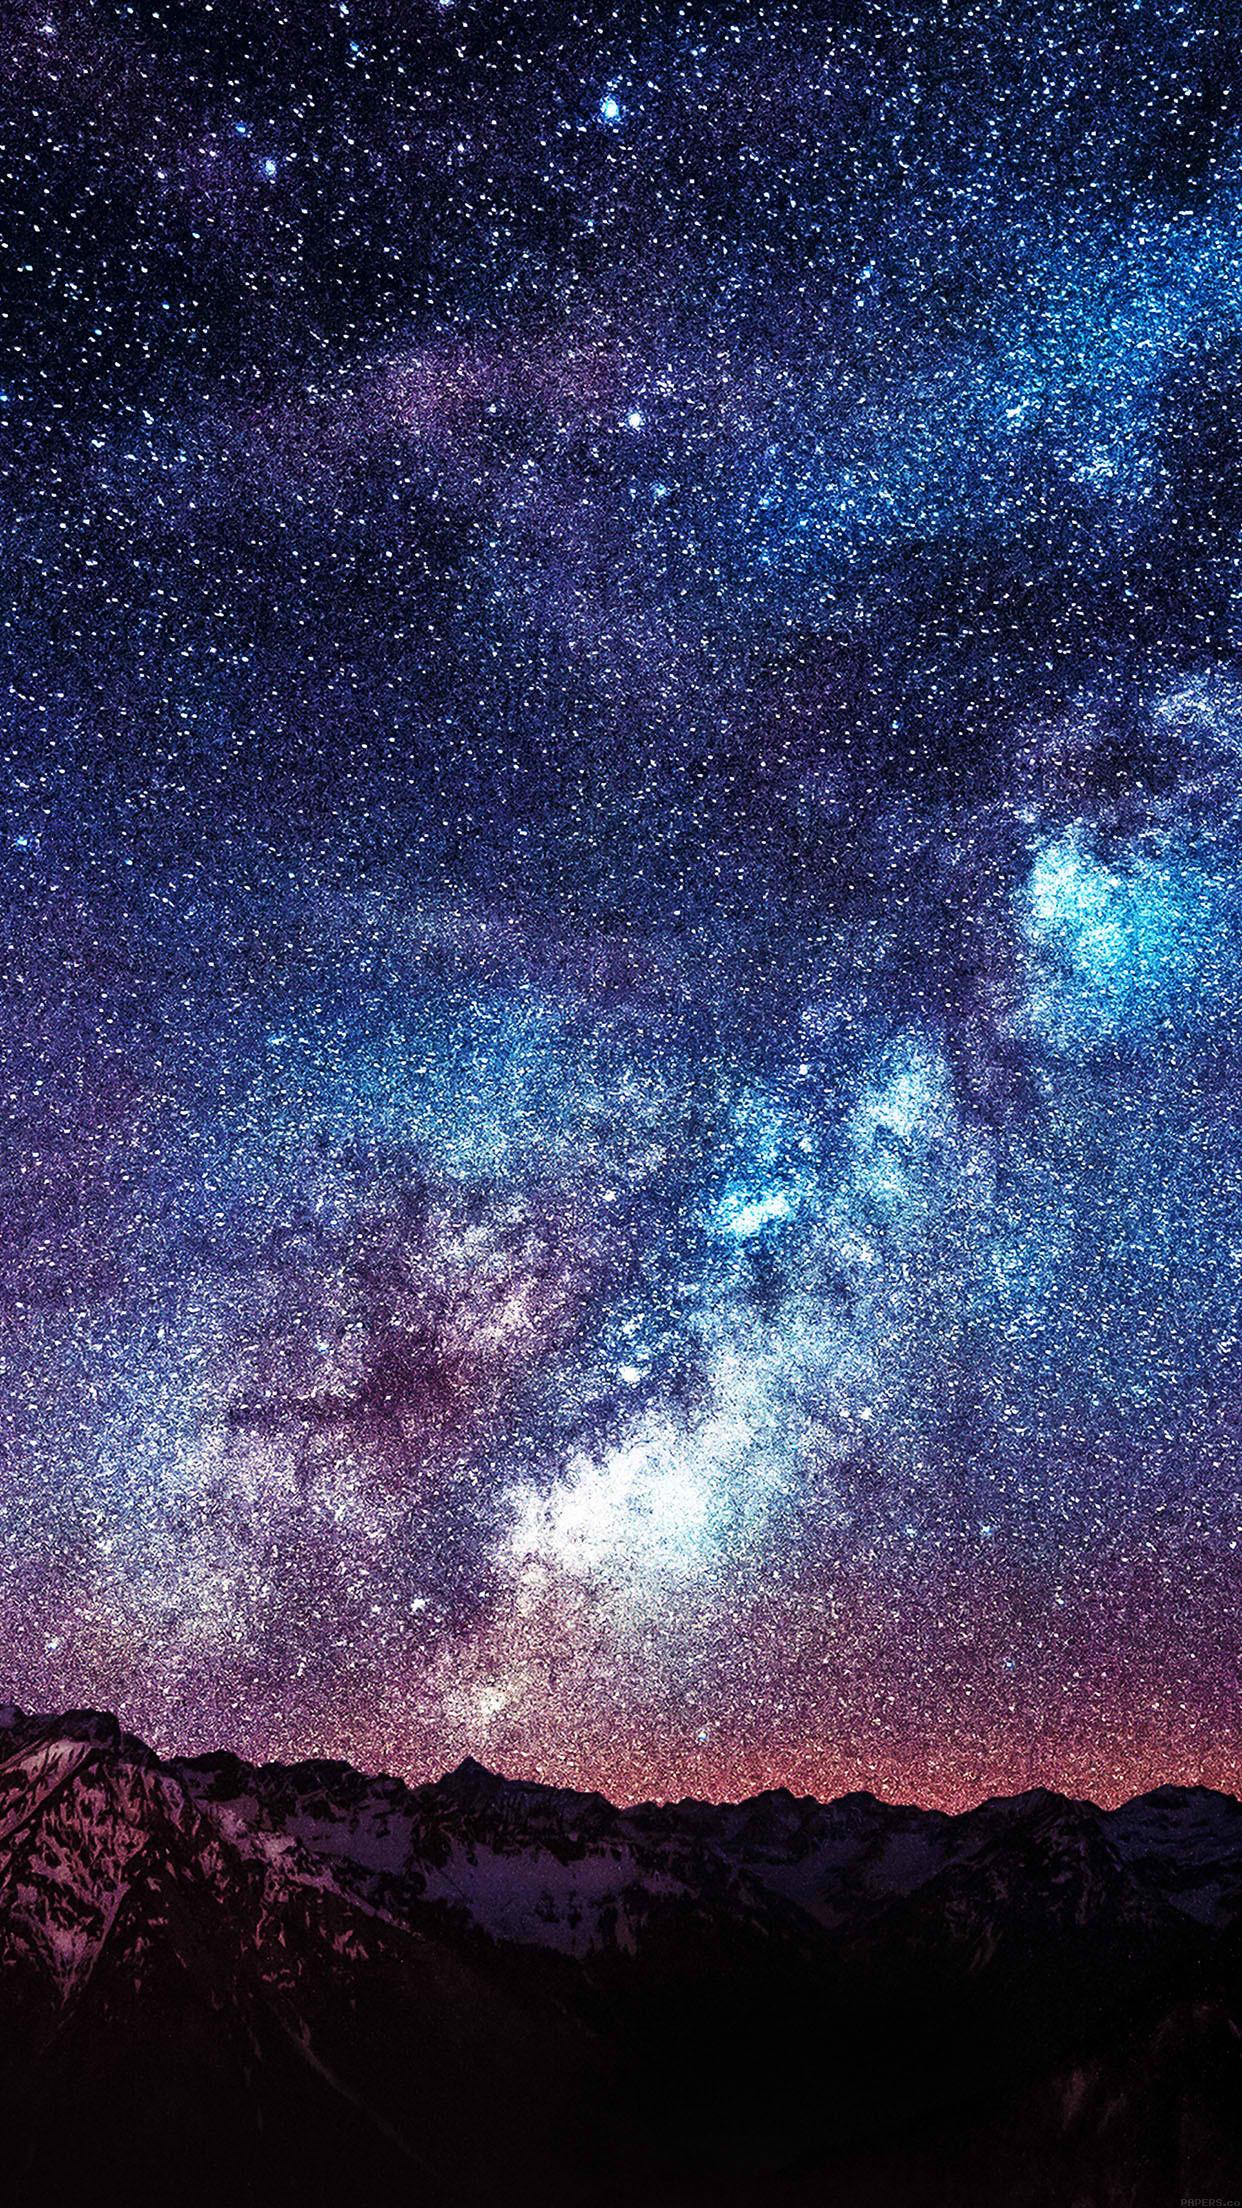 interstellar-space-night-stars-fire-best-9-wallpaper